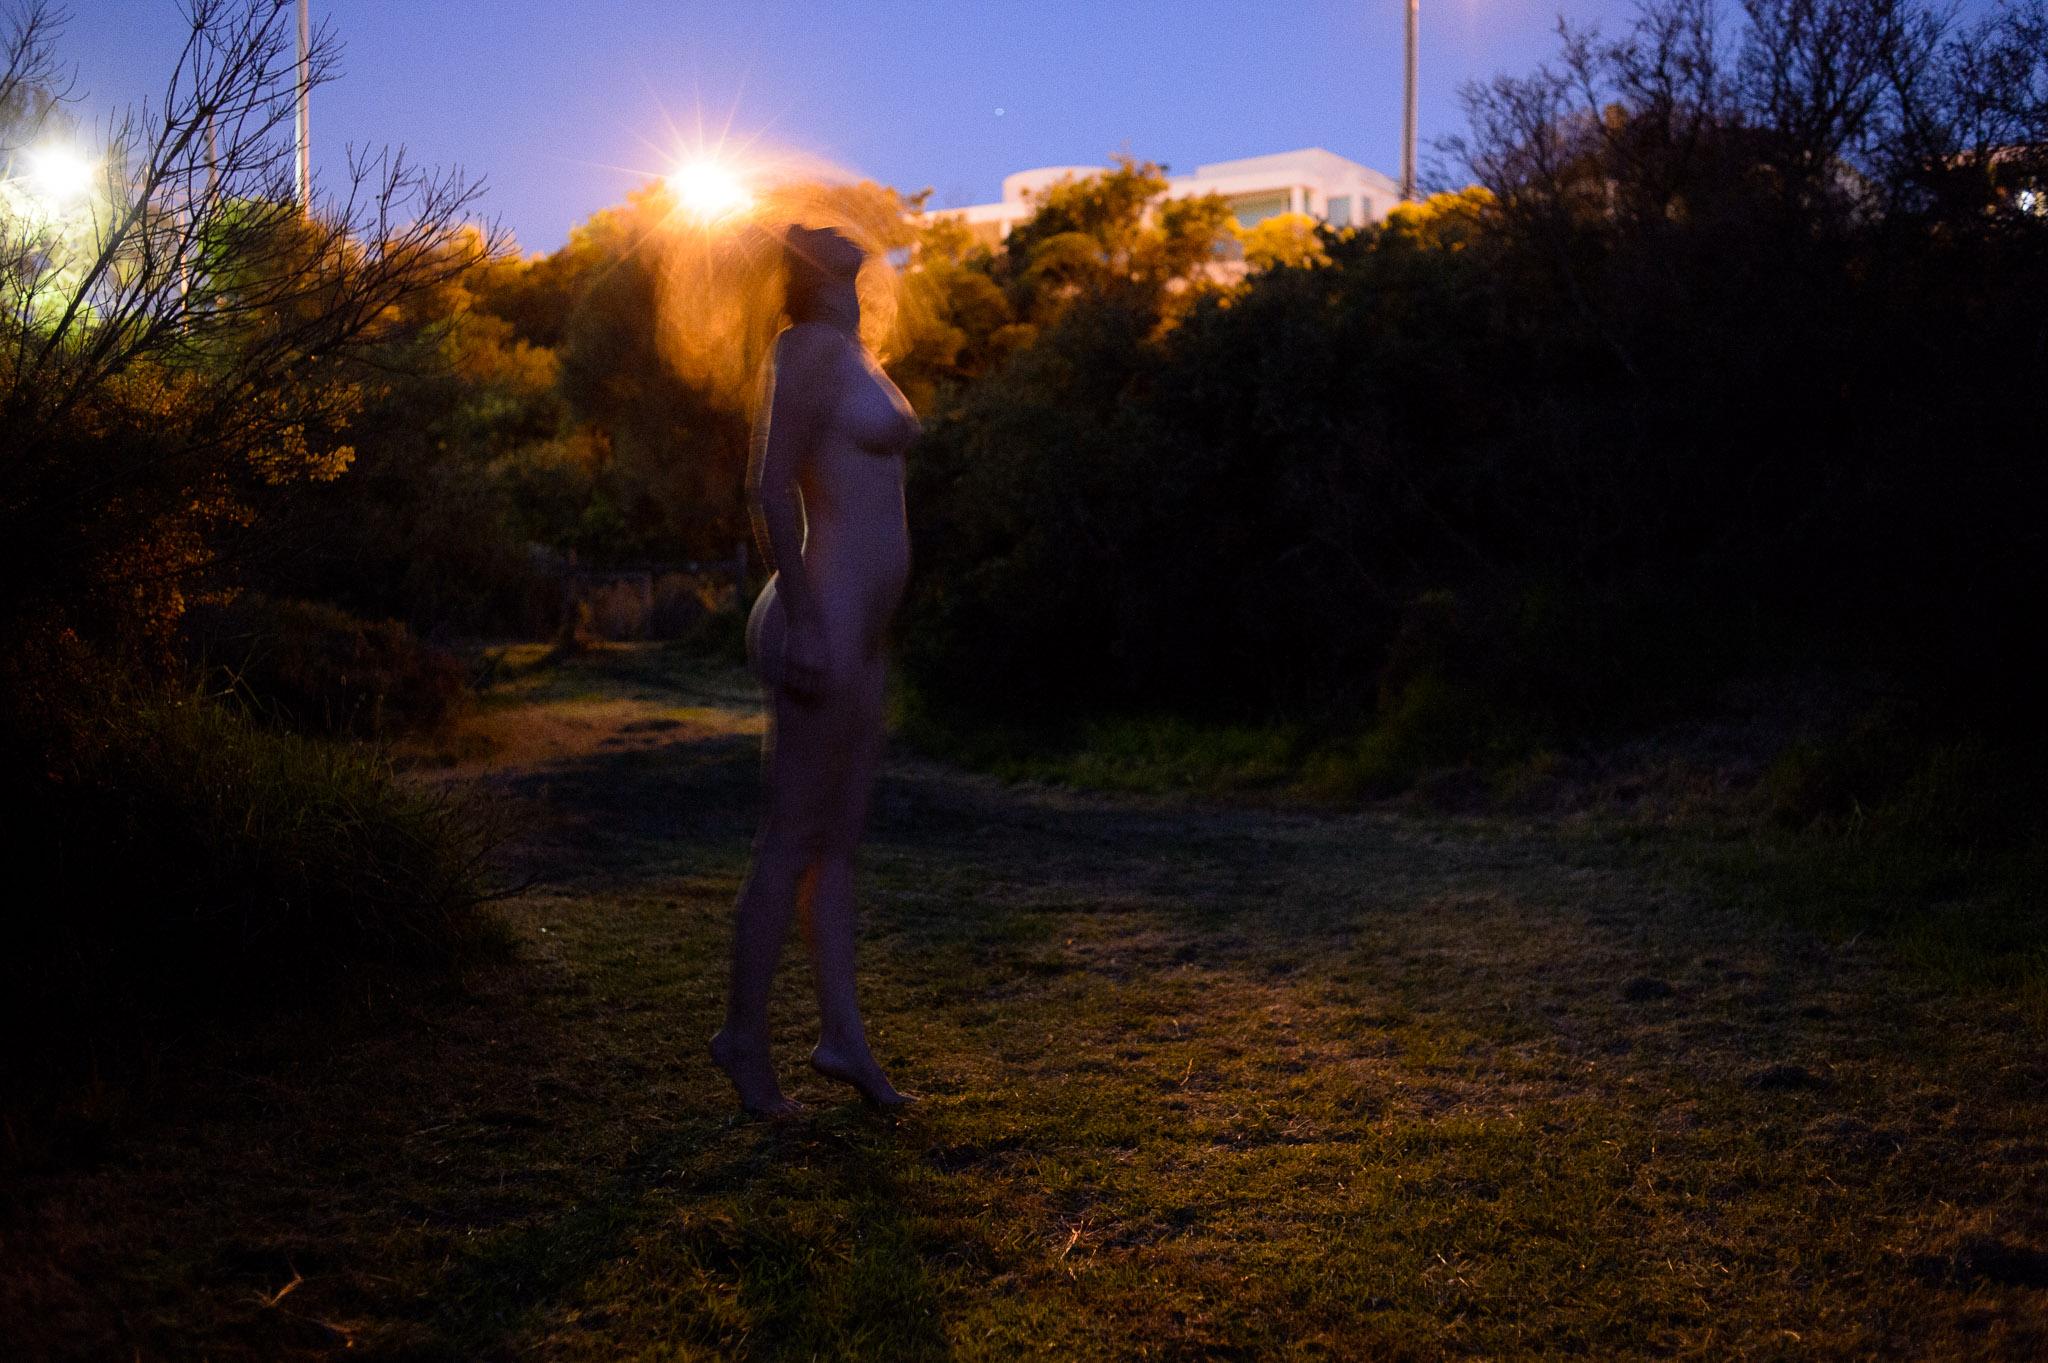 Romahni Rose, Brighton night - D-eye Photography - Blog